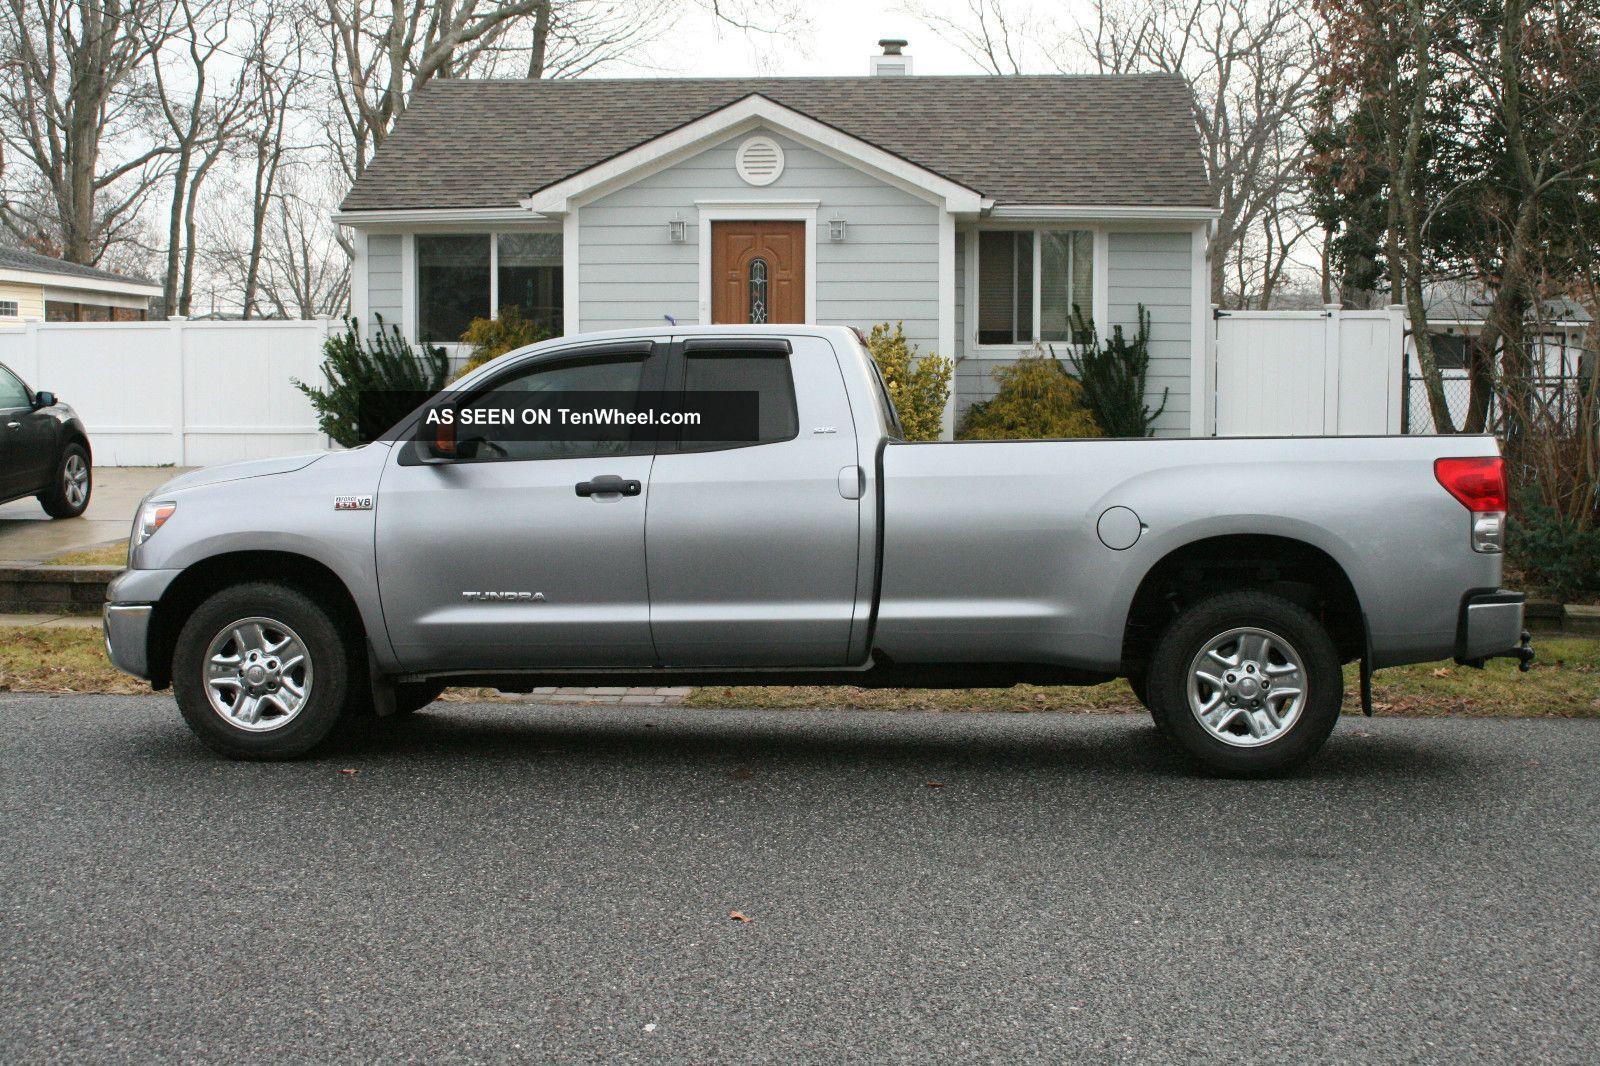 2007 toyota tundra sr5 loaded crew cab pickup 4 door 5 7l 8 39 long bed. Black Bedroom Furniture Sets. Home Design Ideas